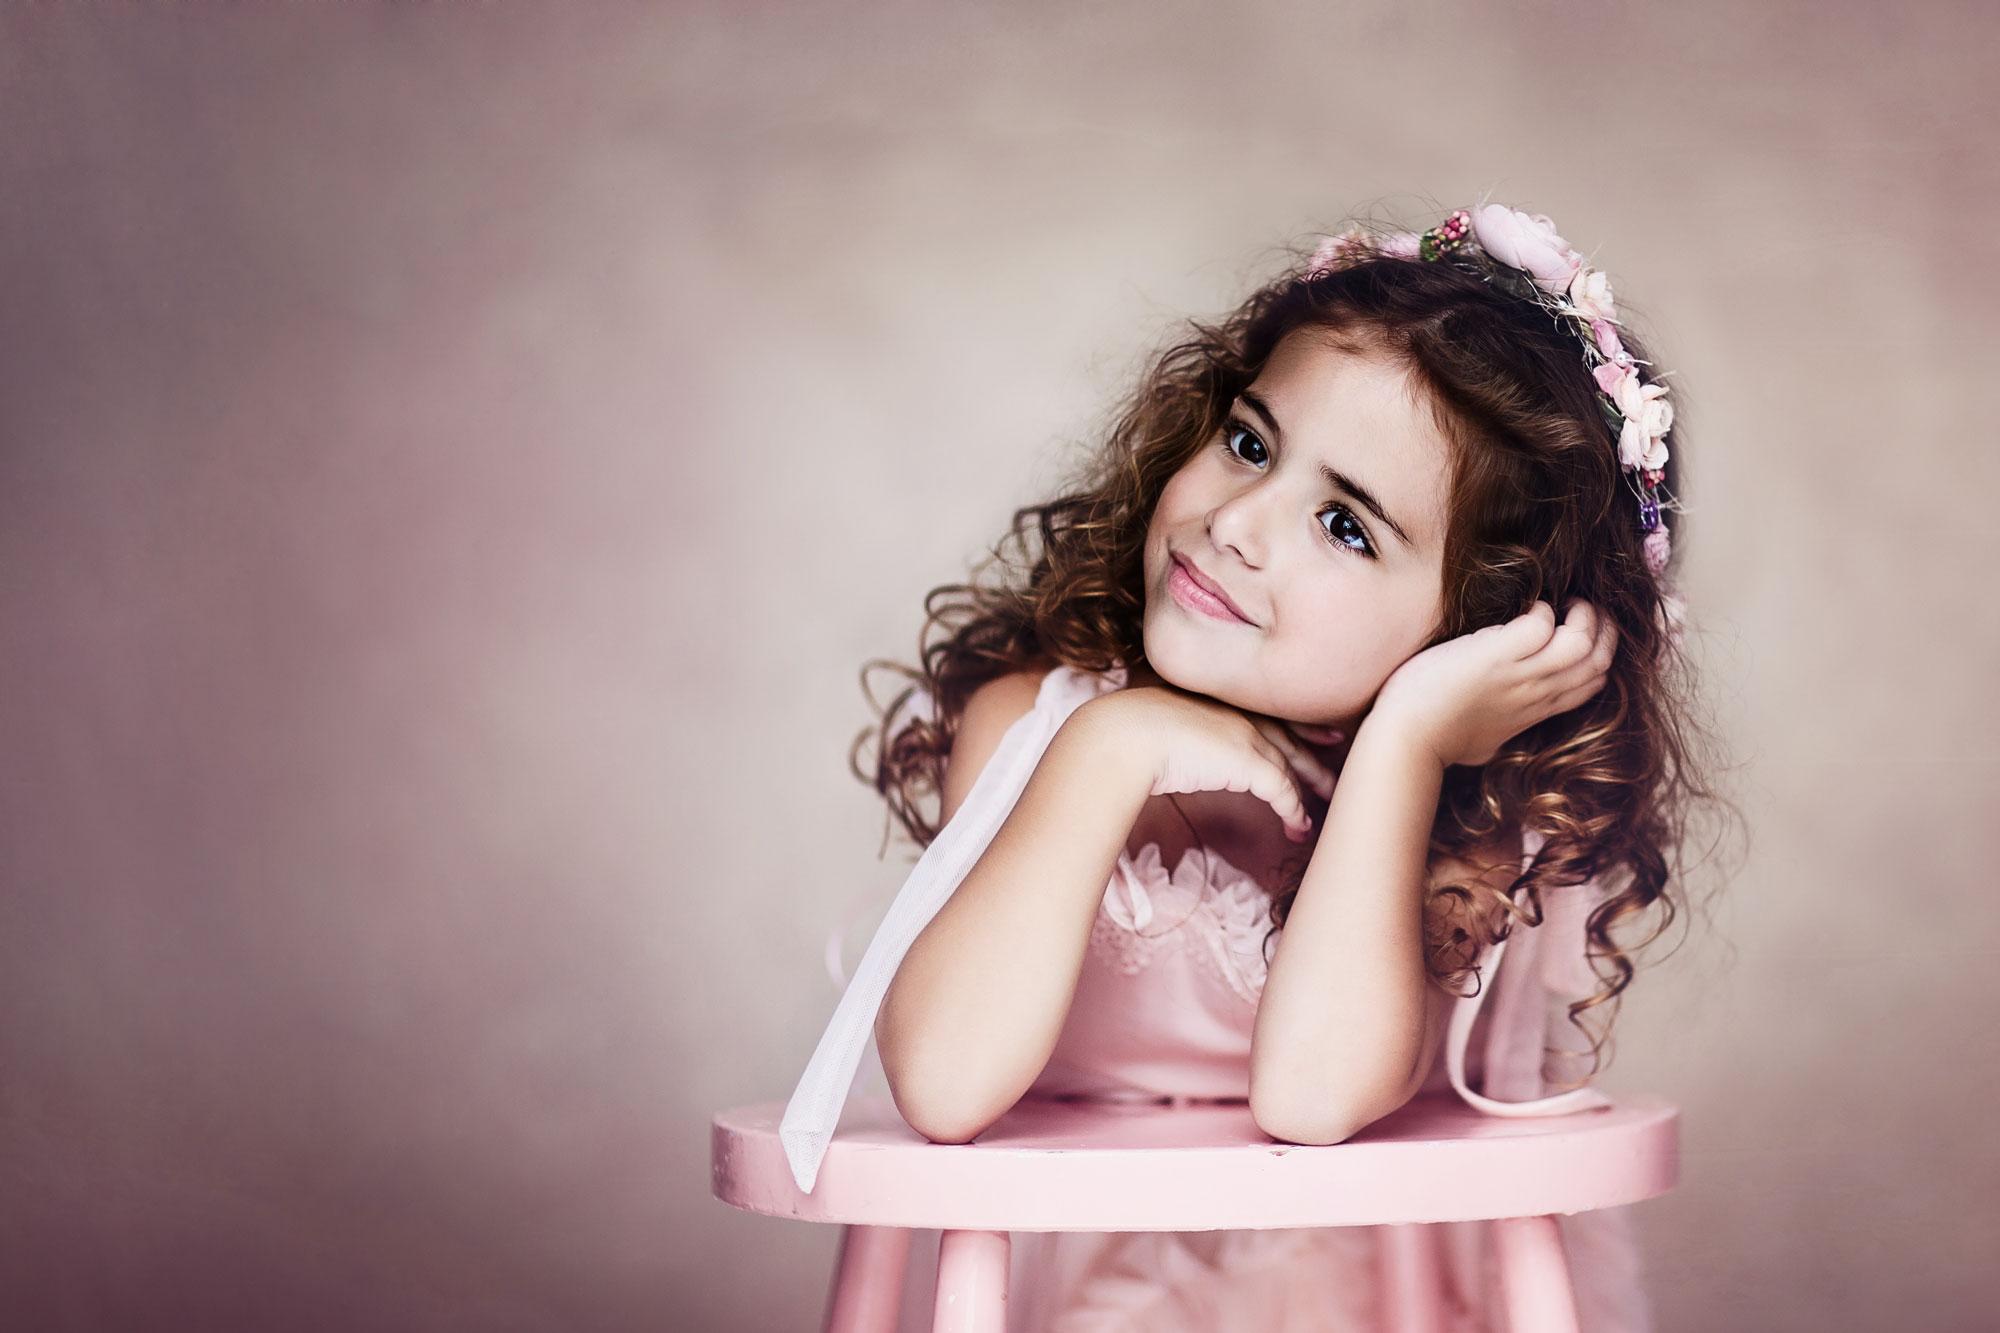 Roberta_baneviciene_portrait-studio_January_UK_17_138607.jpg